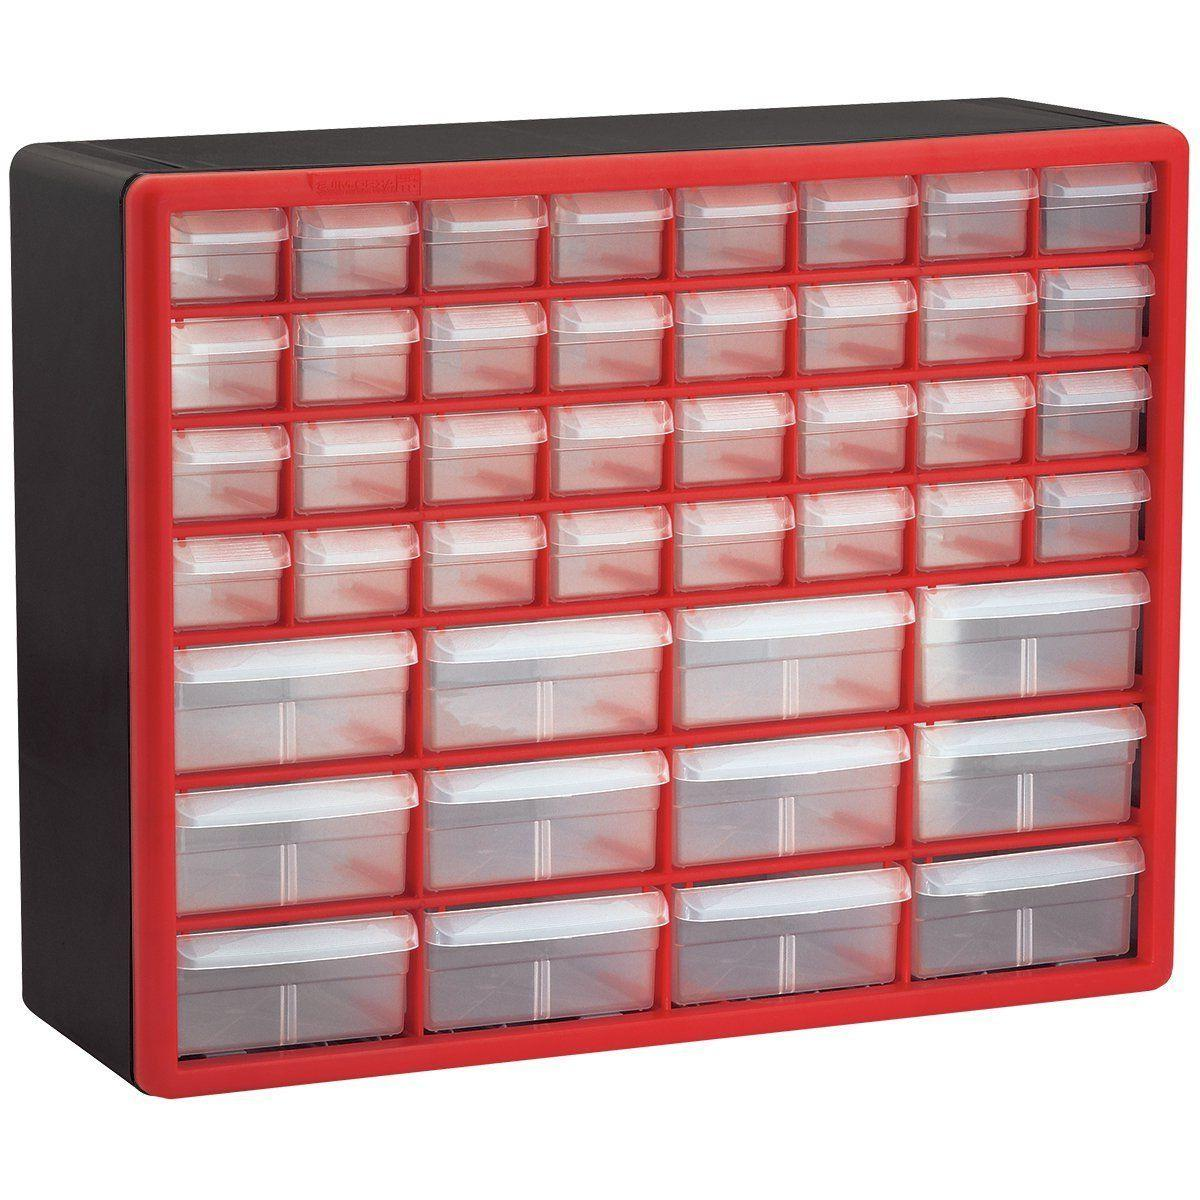 Akro-Mils 10144REDBLK 44-Drawer & Plastic Red & Black